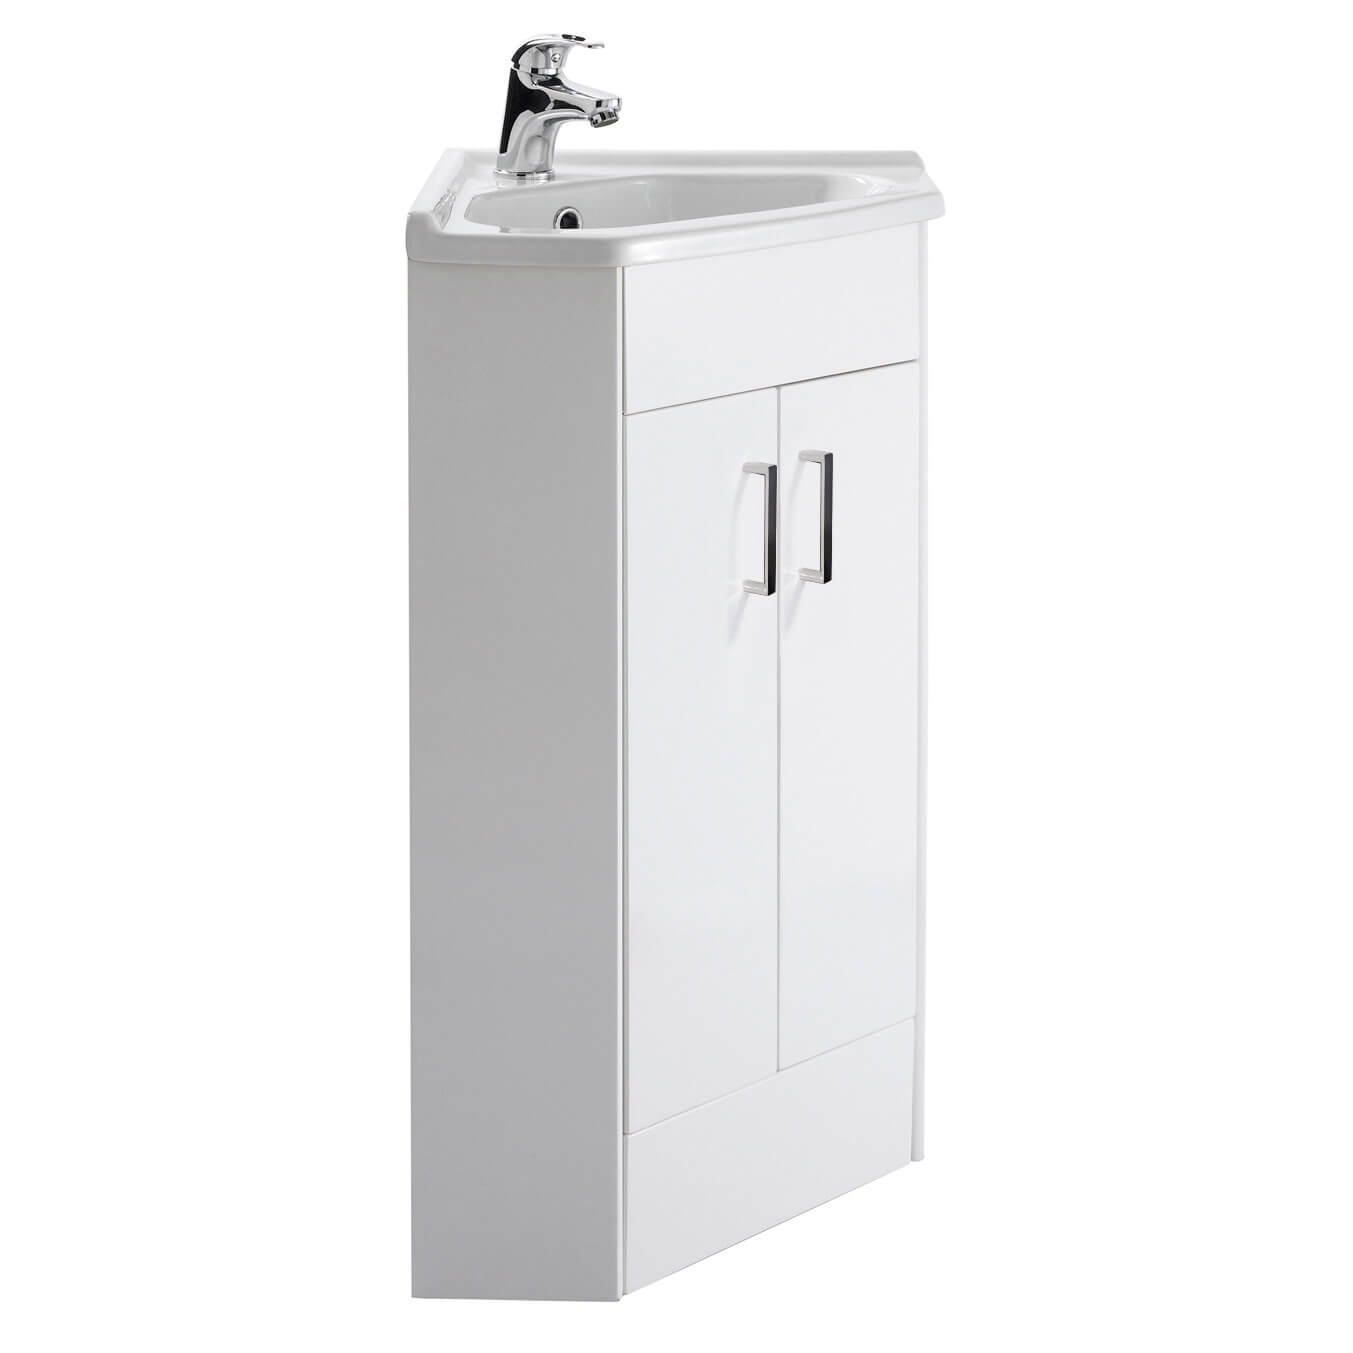 Vellamo Alpine White Gloss 2 Door Corner Cabinet Vanity Unit Ceramic Basin Tap Warehouse